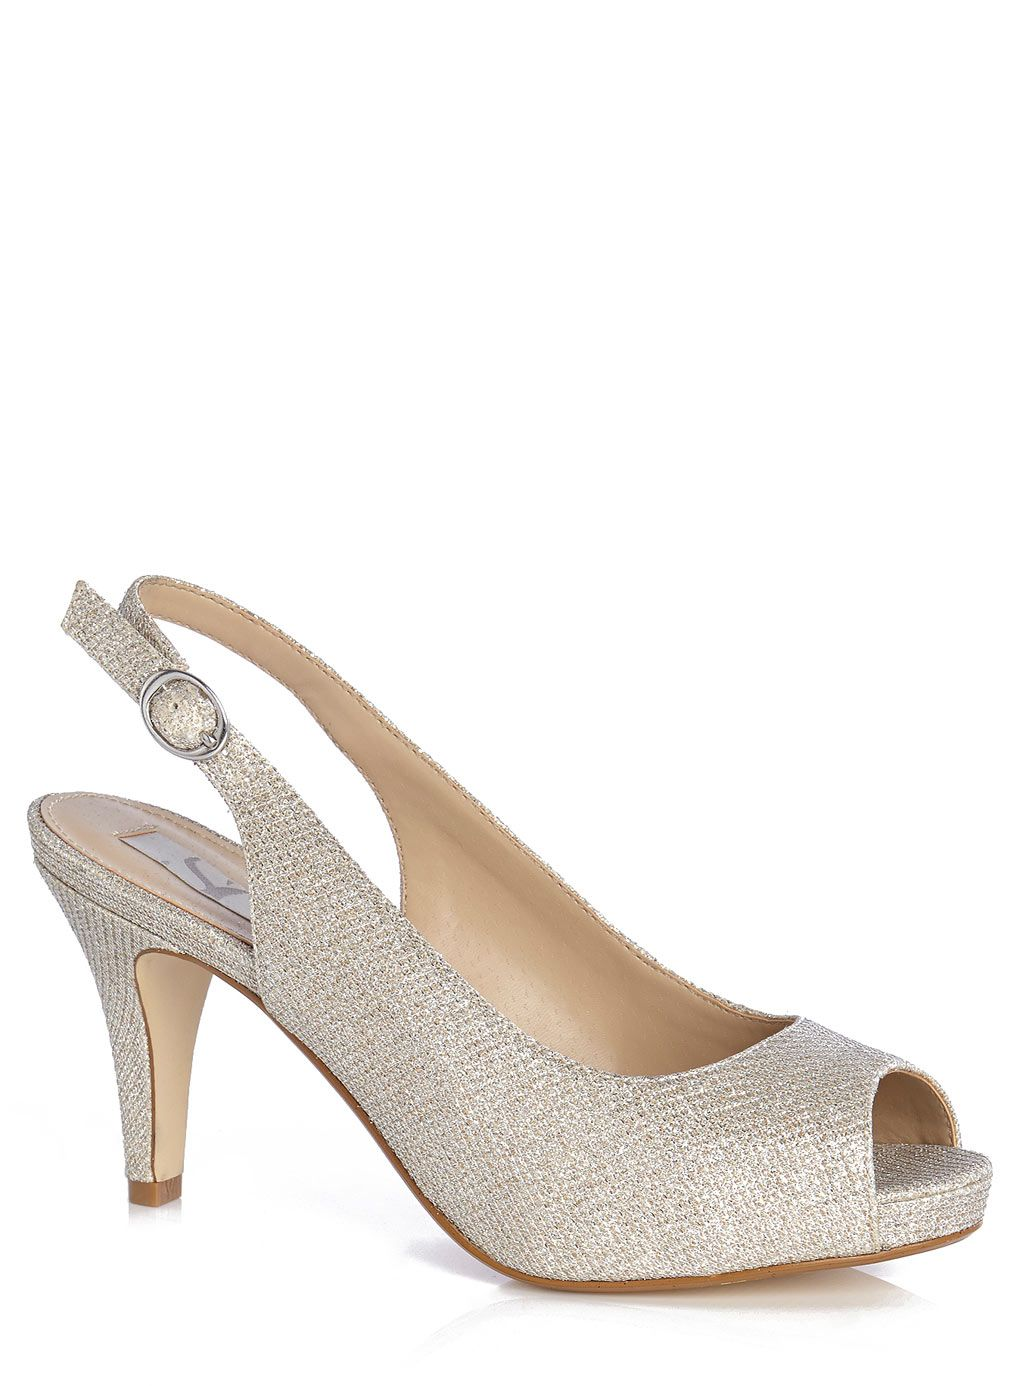 57c6c511935 Pewter Shimmer Mesh Peep Toe Sling Back Shoe - adult bridesmaids - Wedding